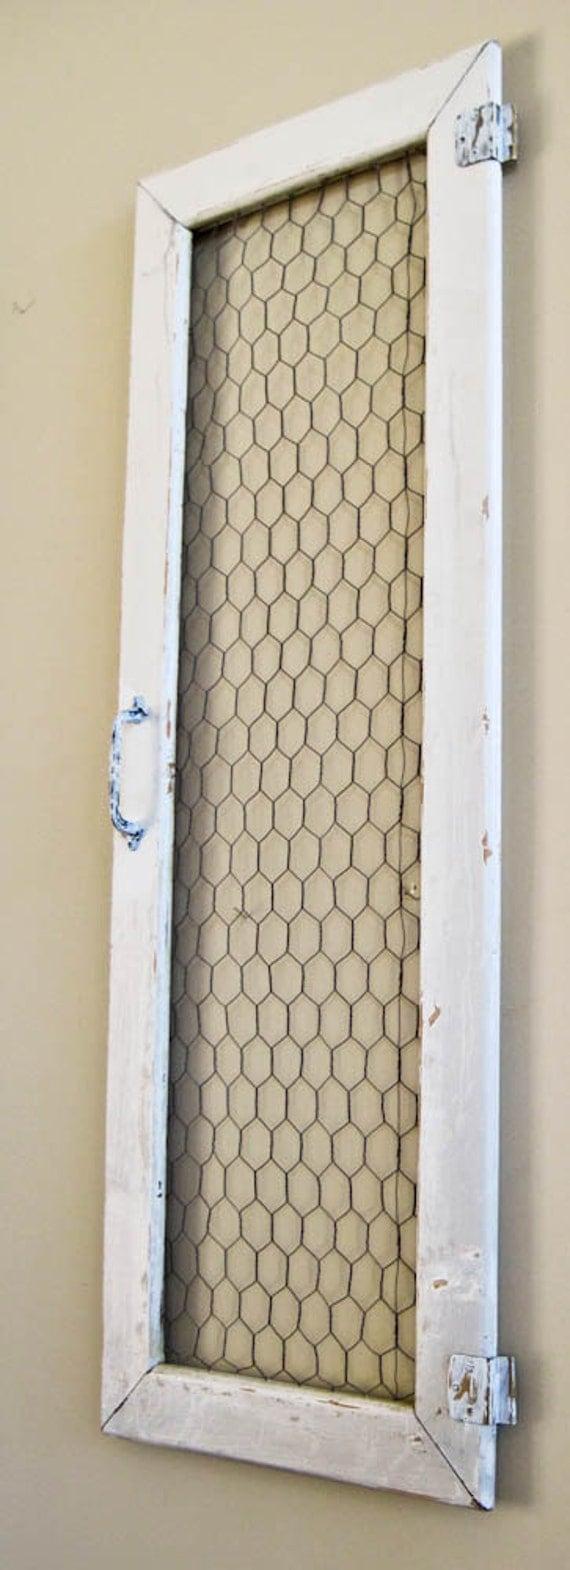 best 28 door wall hanging small kisari wall hanging. Black Bedroom Furniture Sets. Home Design Ideas